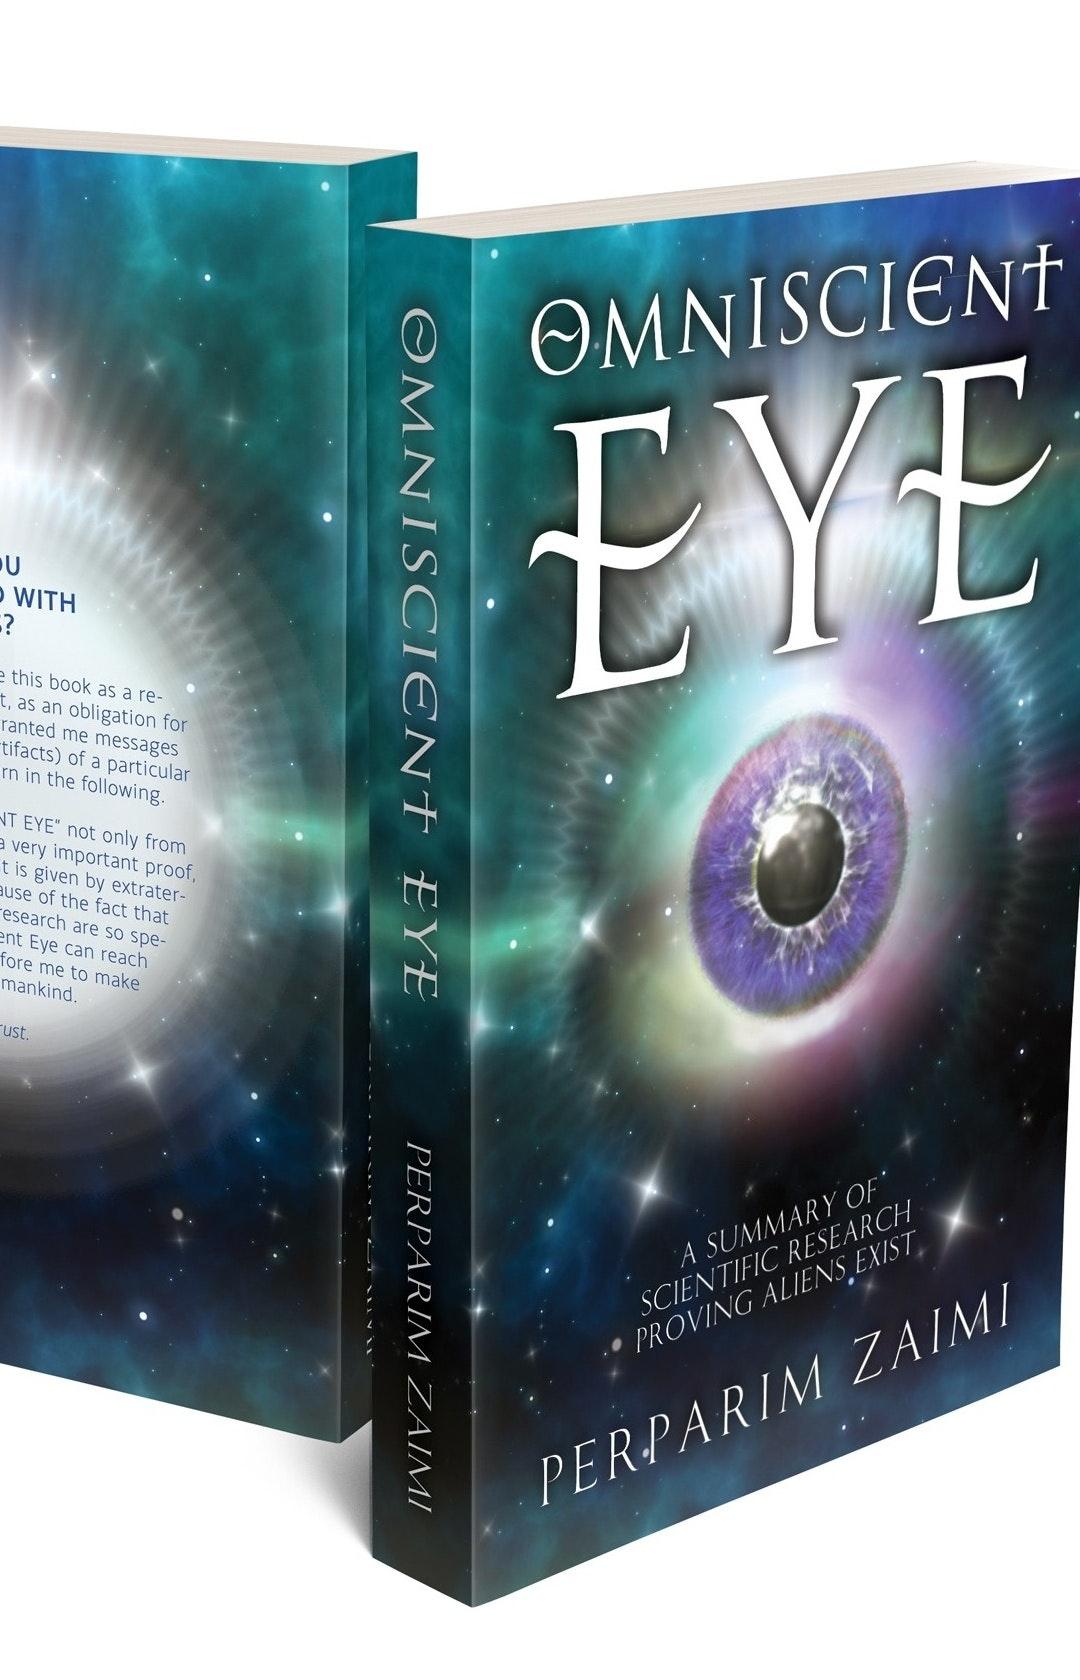 Eye nebula and custom typesetting